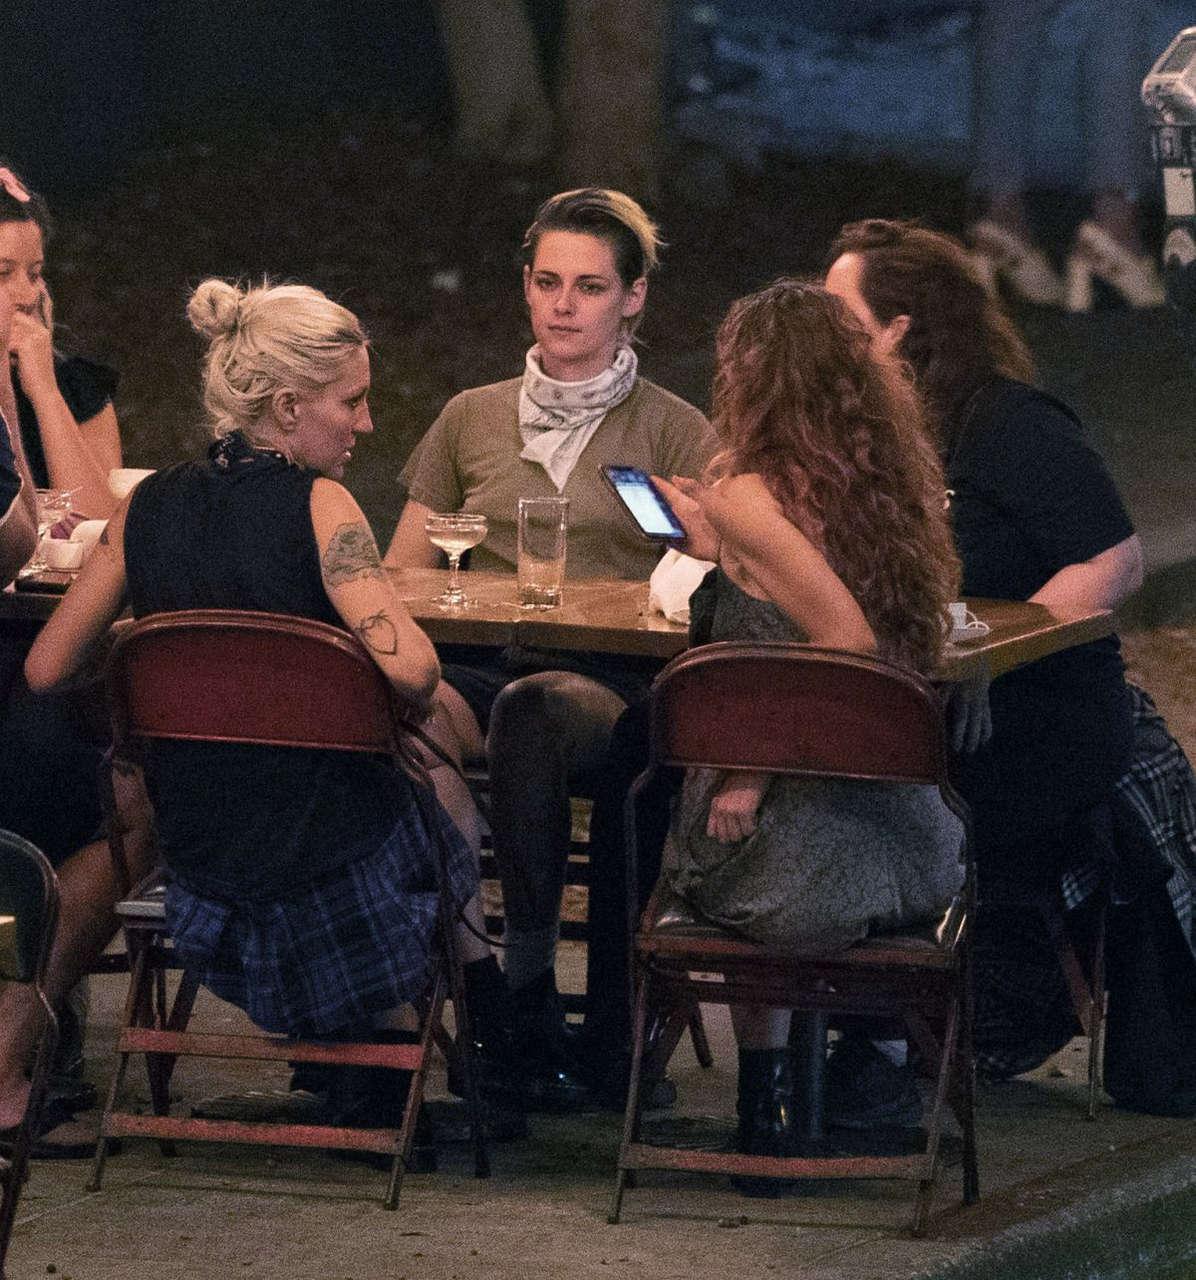 Kristen Stewart Dylan Meyer Night Out Los Angeles